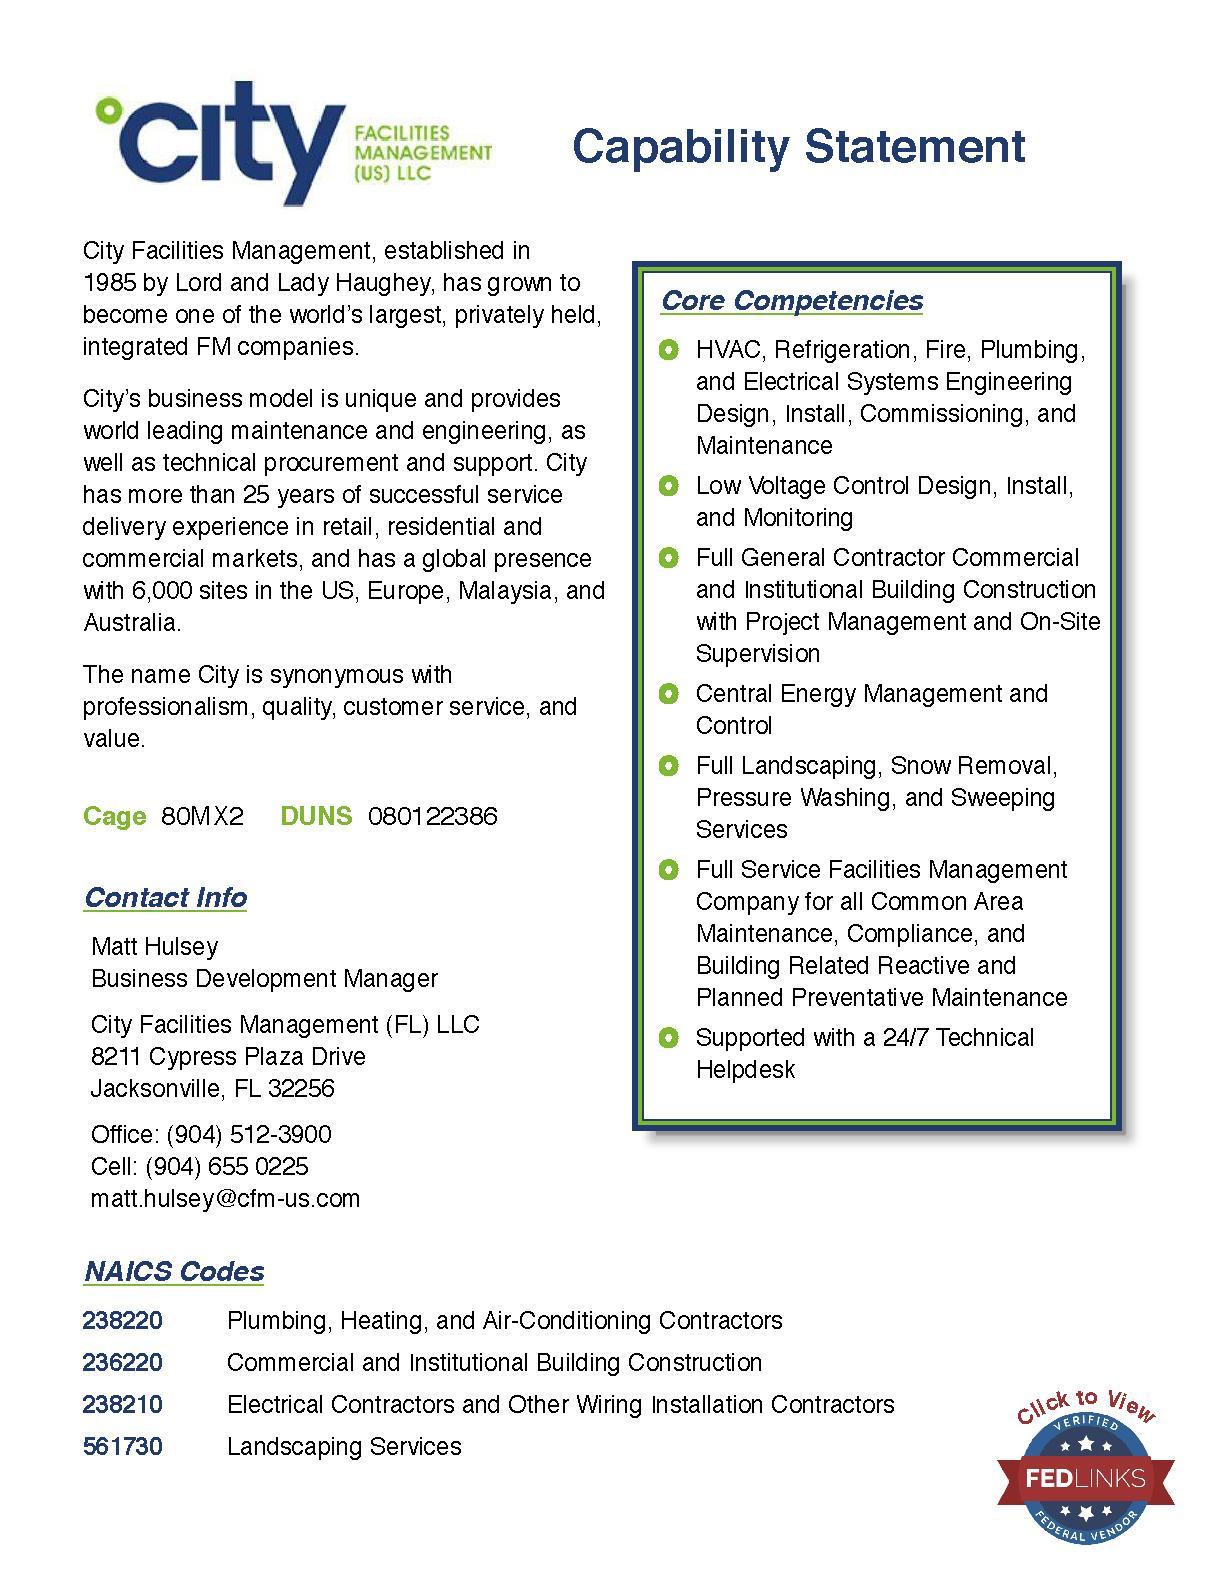 Engineering Design Management Llc: City Facilities Management LLCrh:fedlinks.com,Design